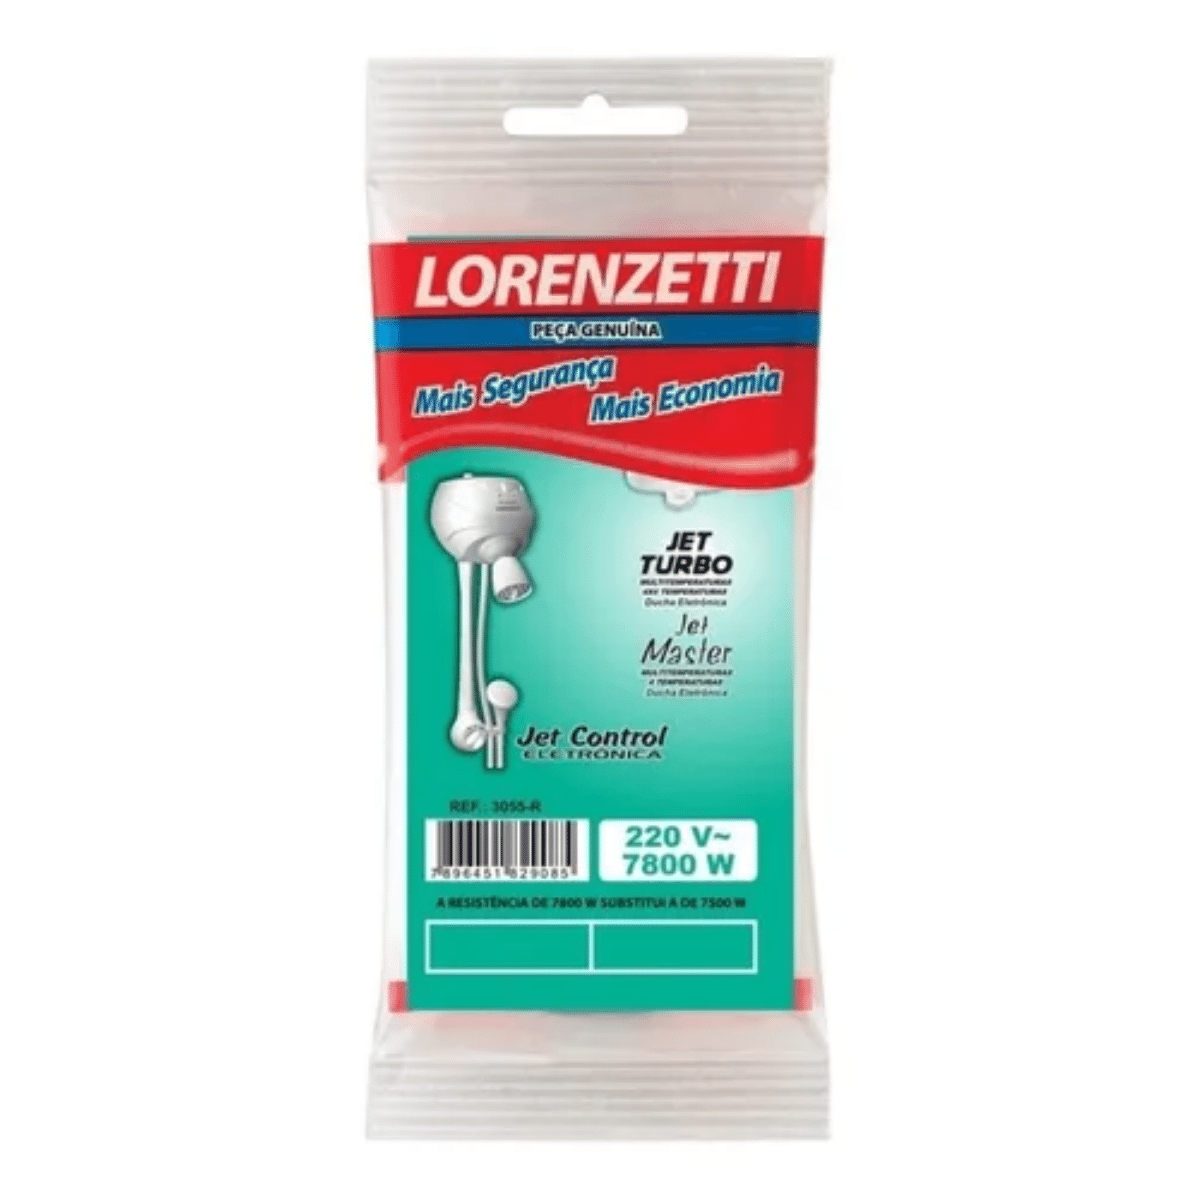 Resistencia Lorenzetti Jet Turbo e Jet Master 110v 5500w